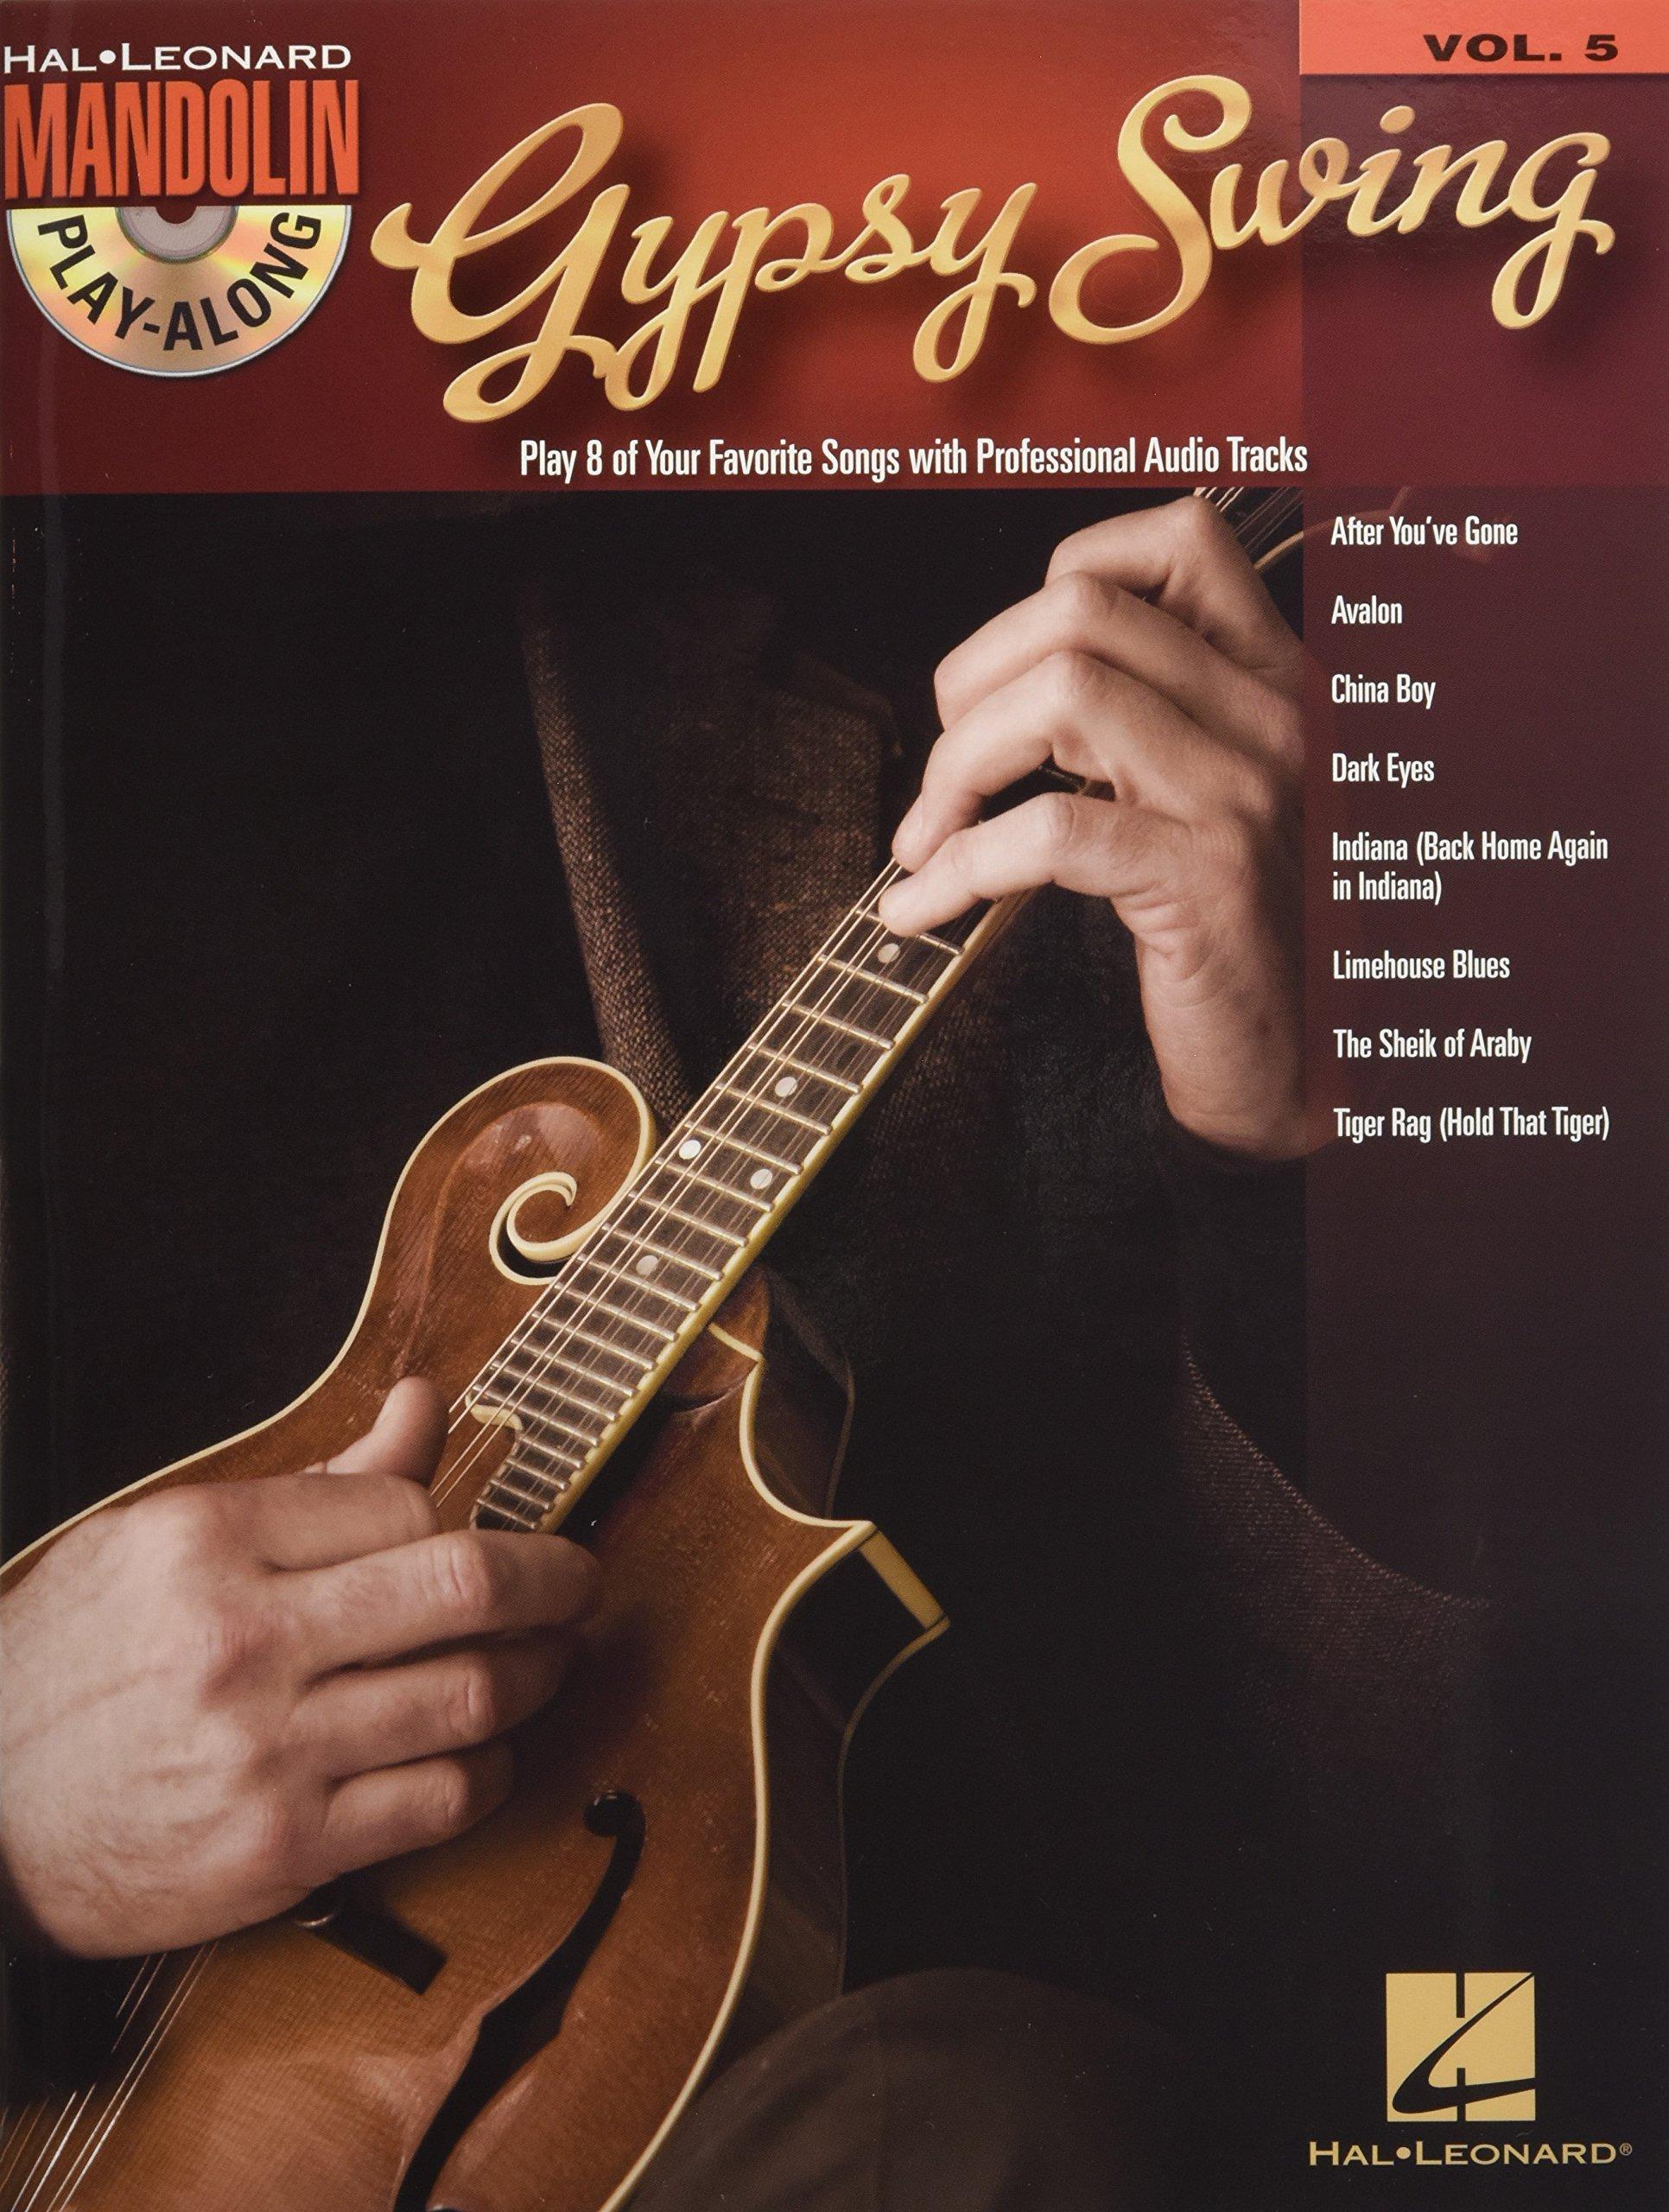 Gypsy Swing: Mandolin Play-Along Volume 5